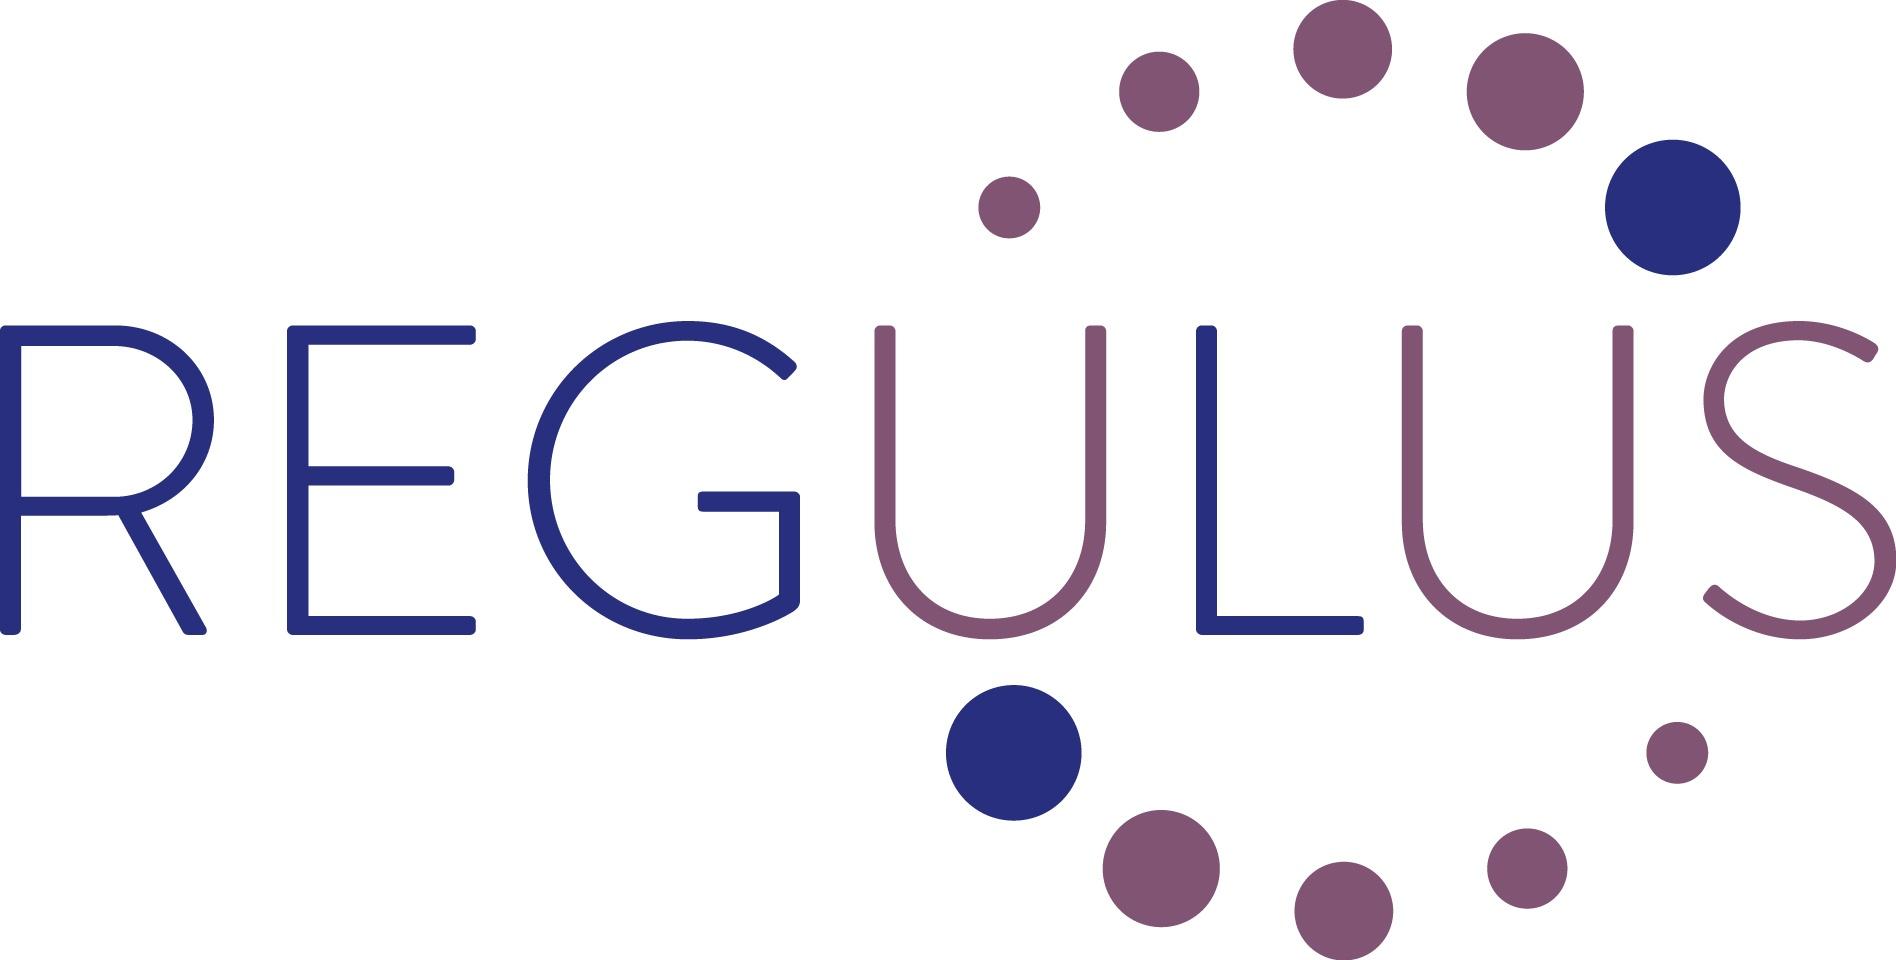 REGULUS-LOGO-FINAL.jpg